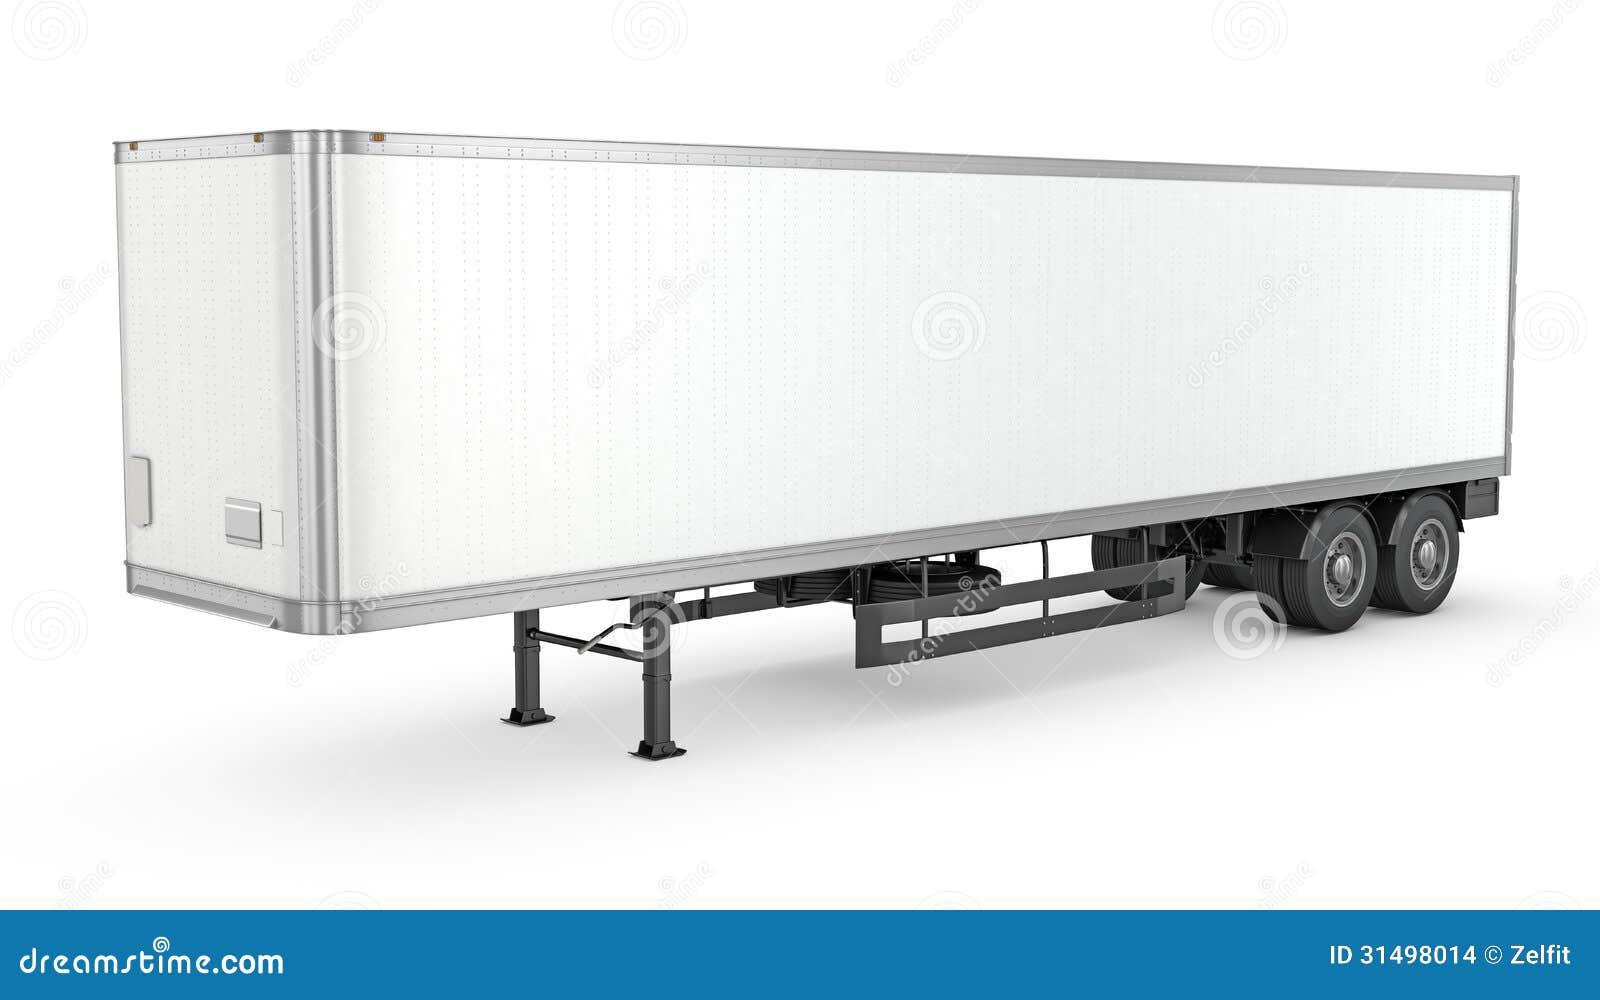 18 Wheel Truck Trailer Diagram : Wheeler truck diagram car tire parts elsavadorla